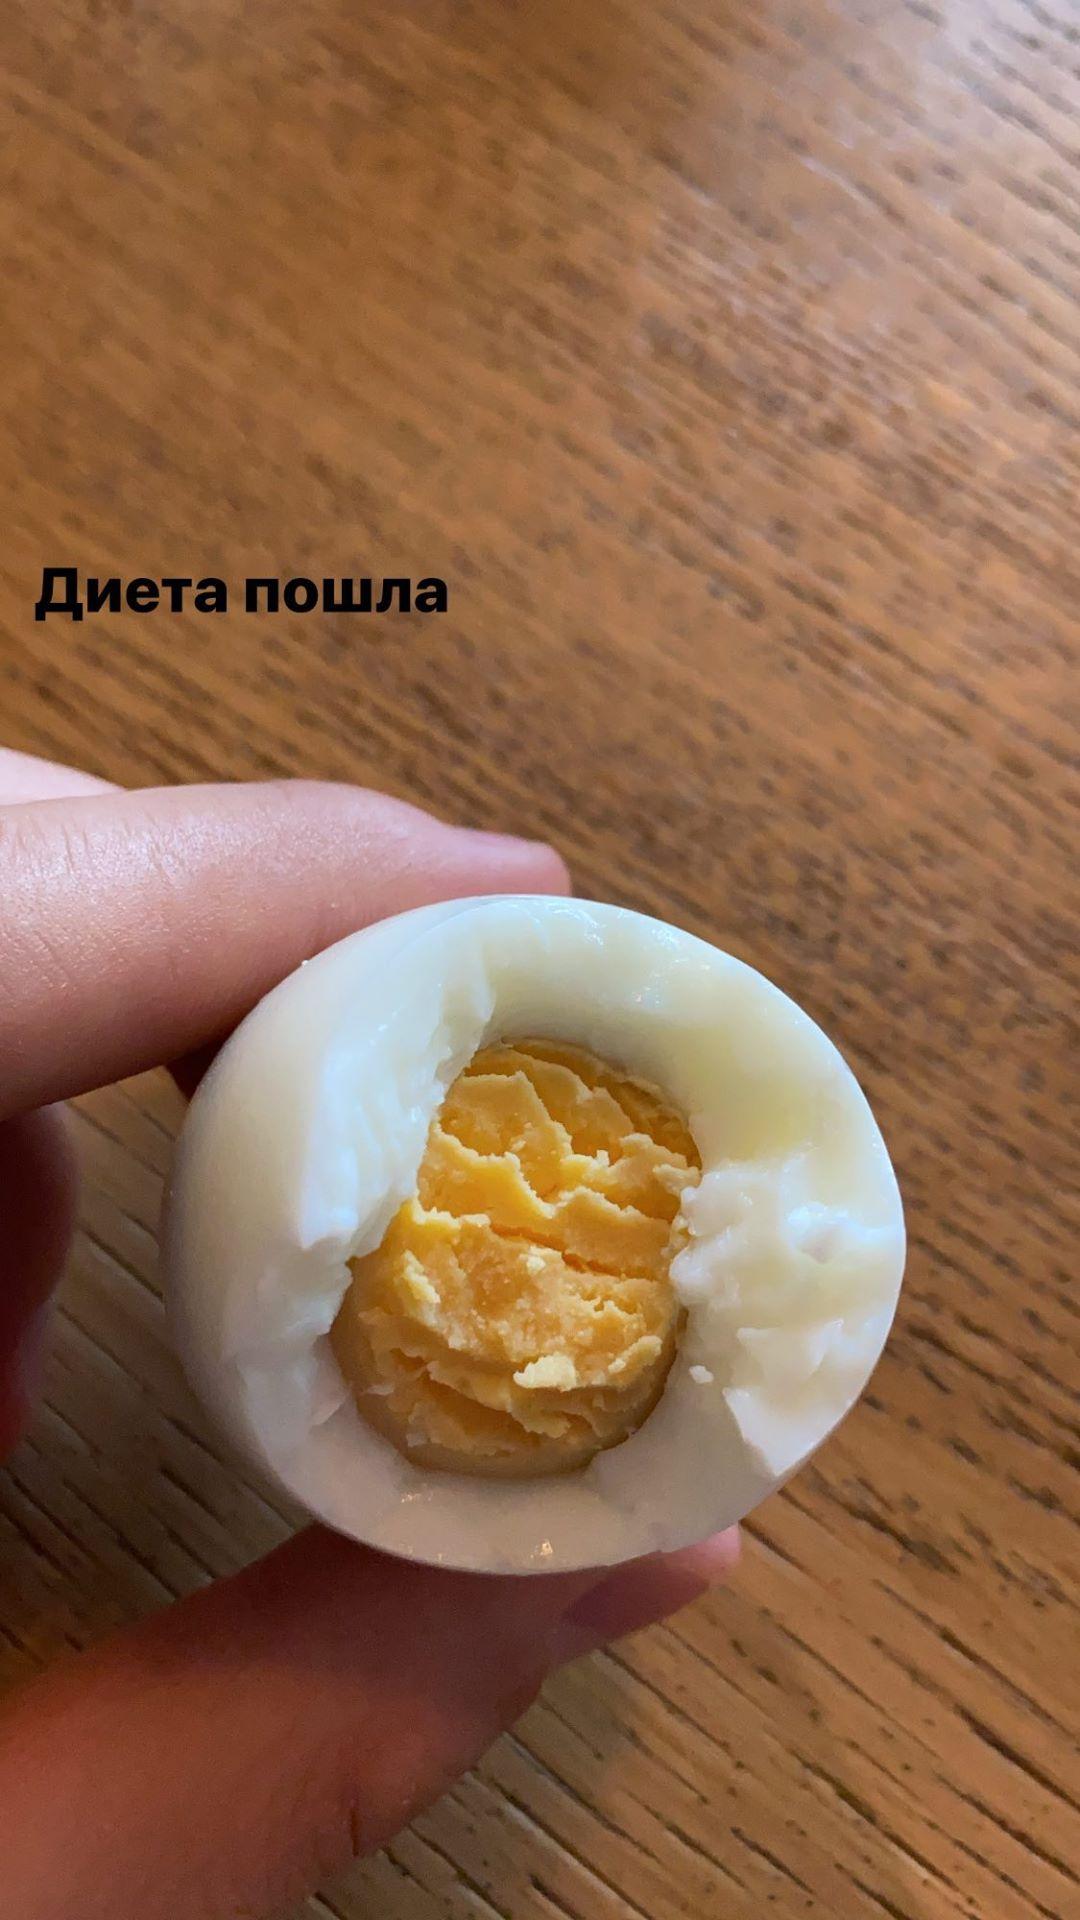 Сторис Хабиба Нурмагомедова